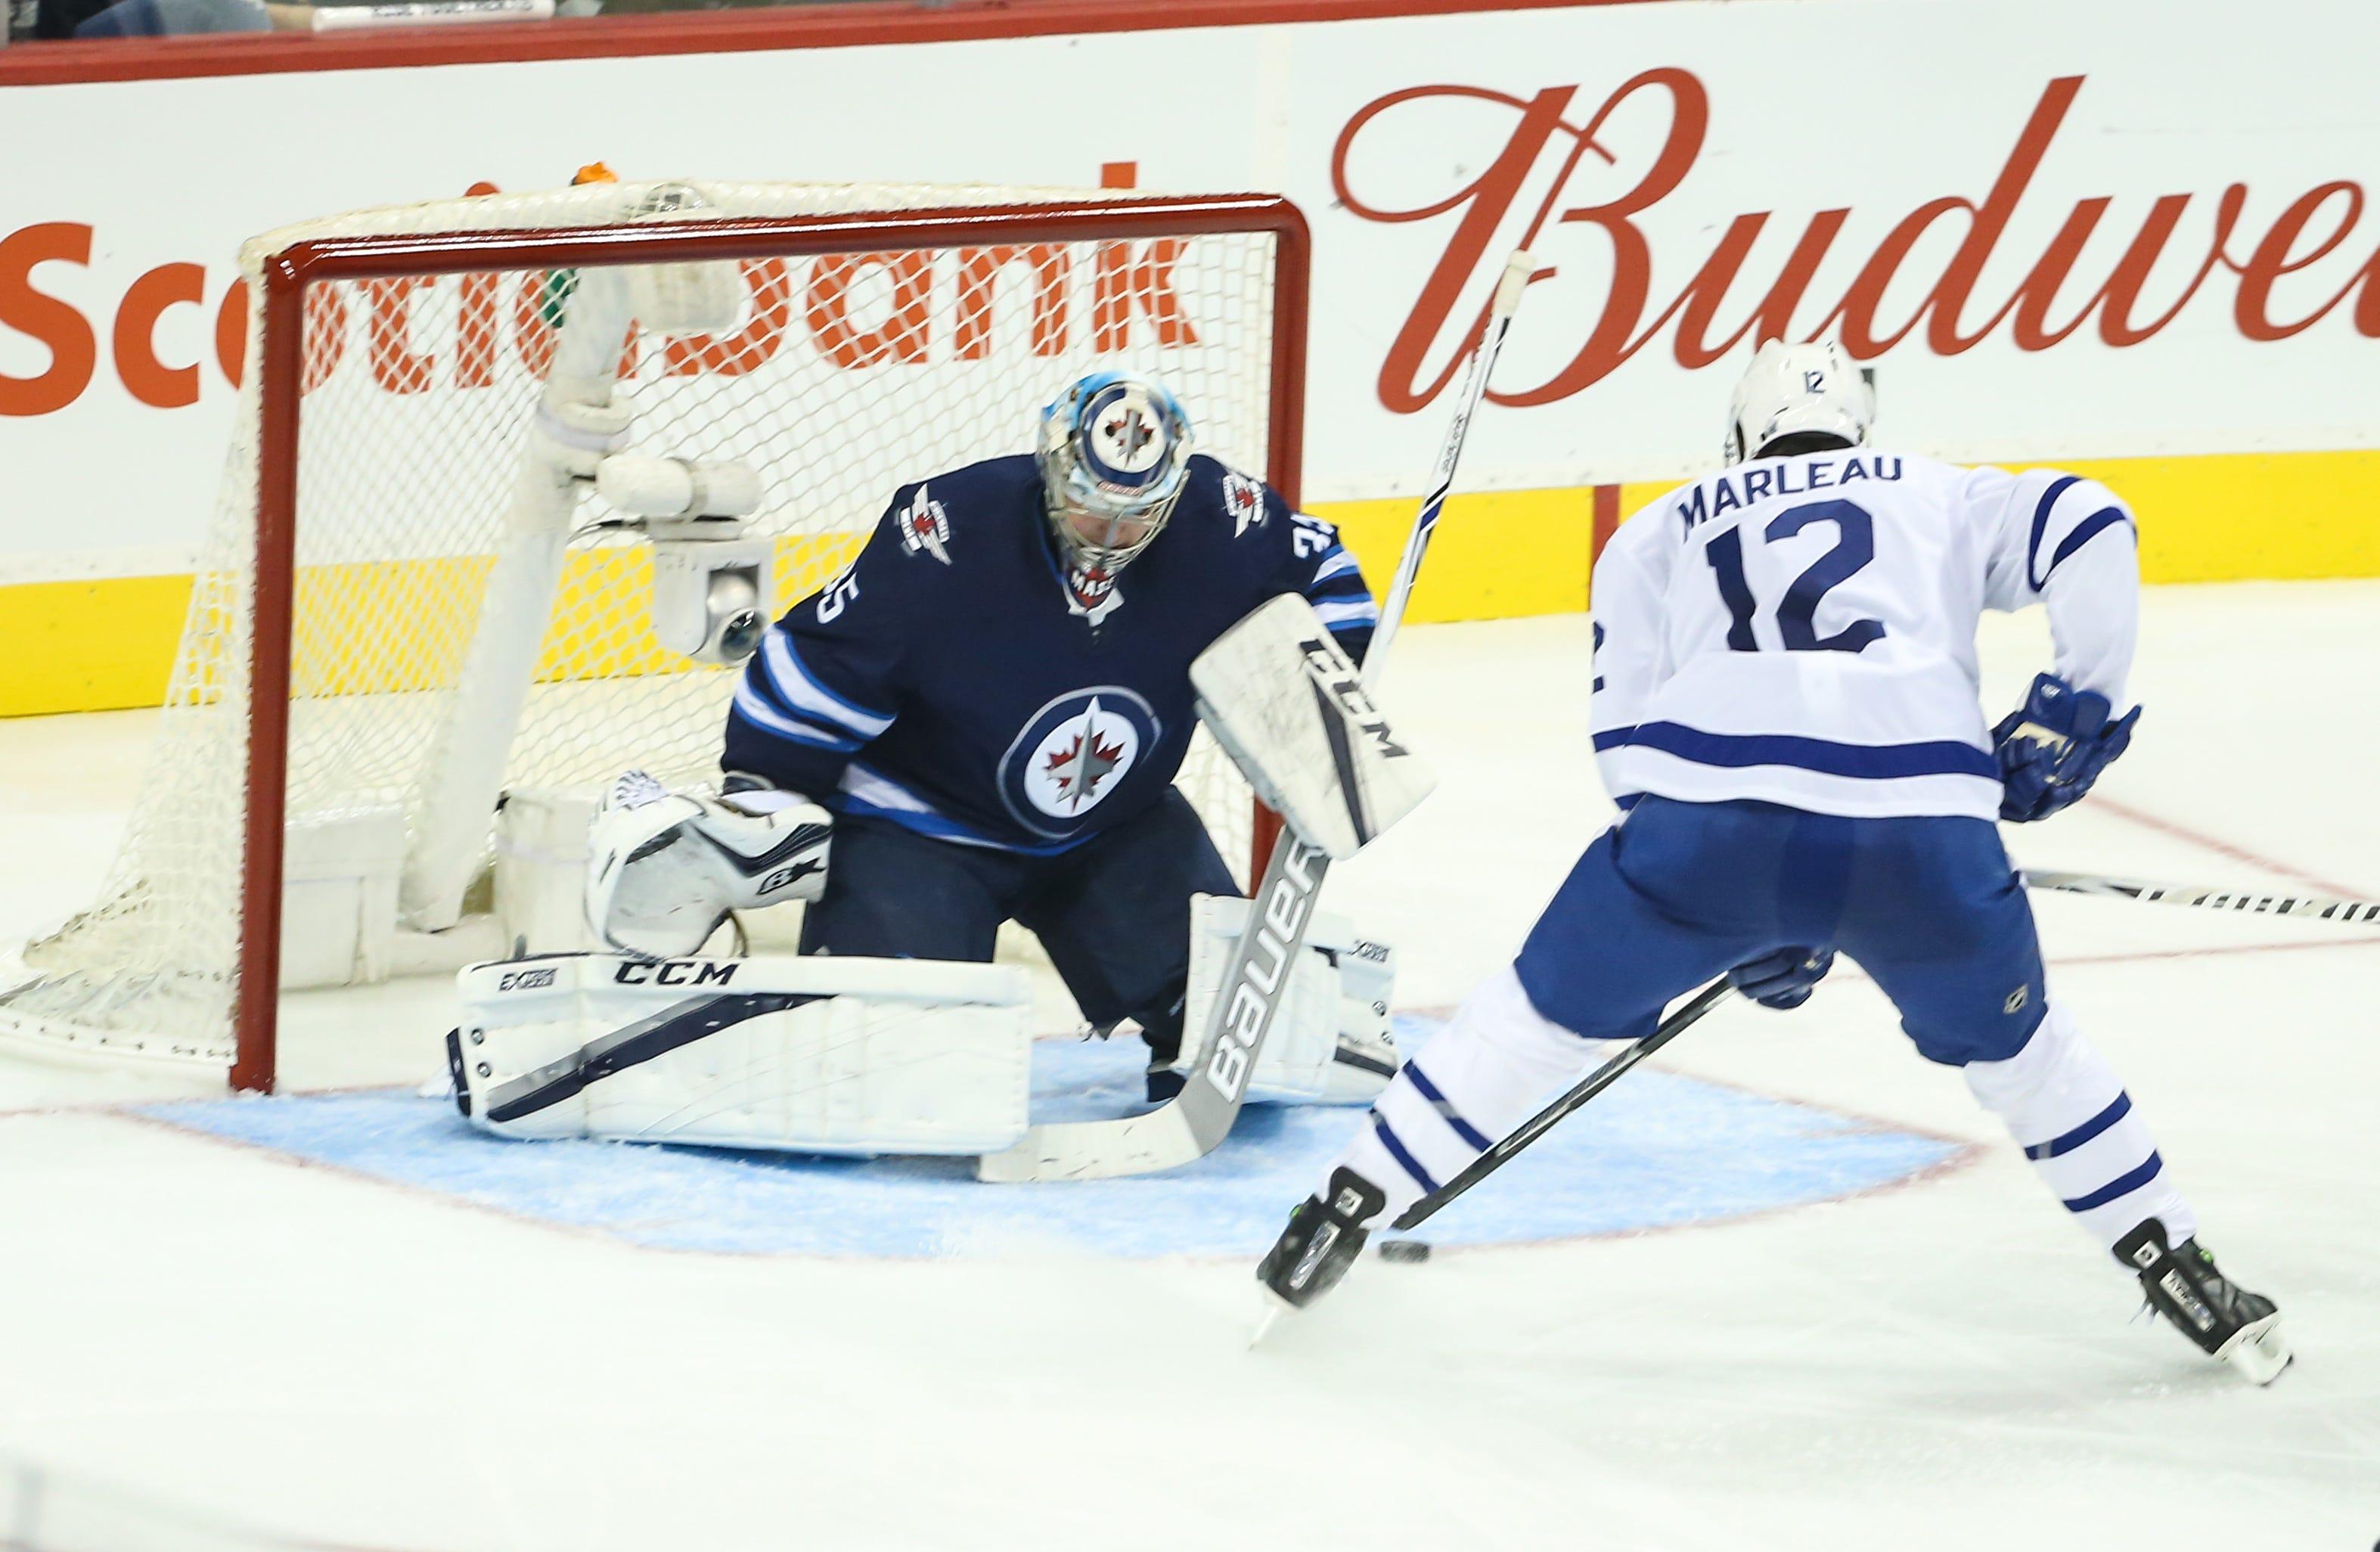 Patrick Marleau scores twice in Toronto Maple Leafs' debut